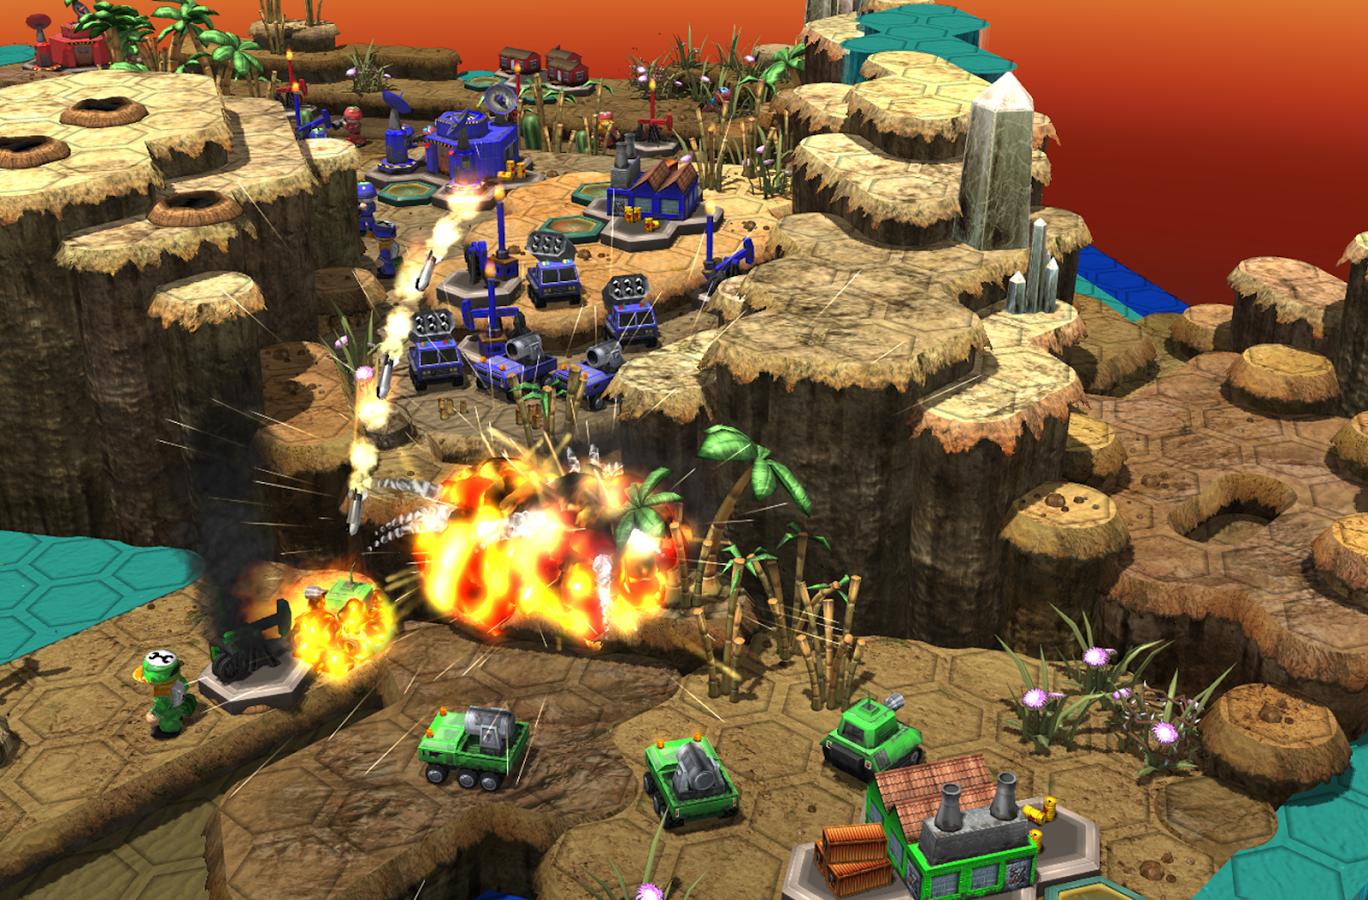 Epic Little War Game v 2.010 apk mod DINHEIRO INFINITO